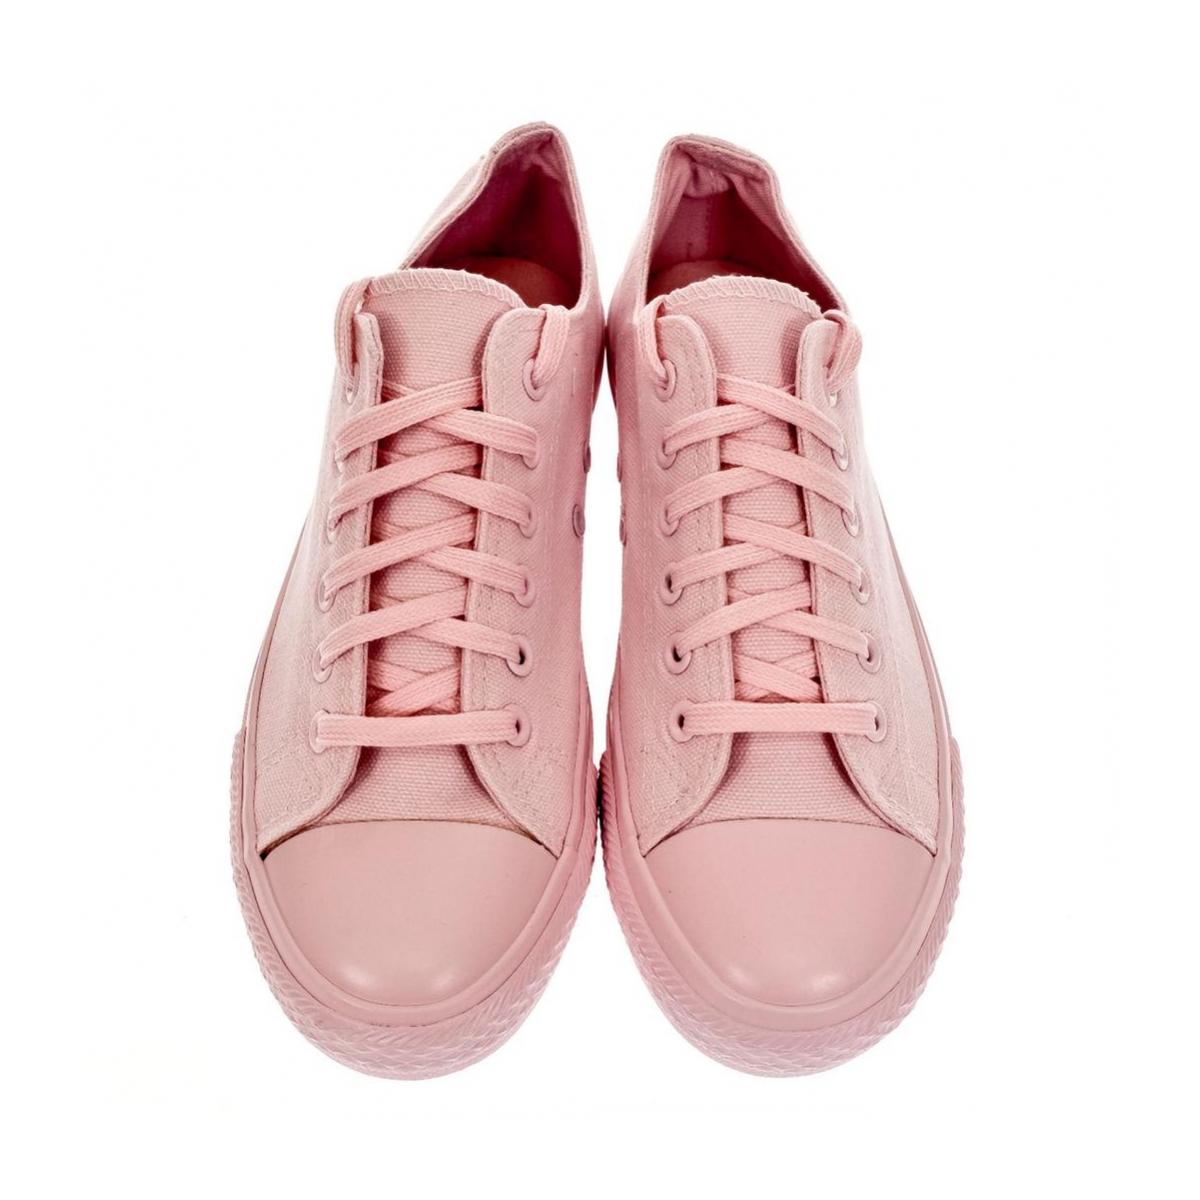 68d874c27077 Dámska svetlo-ružové tenisky REINA - 5